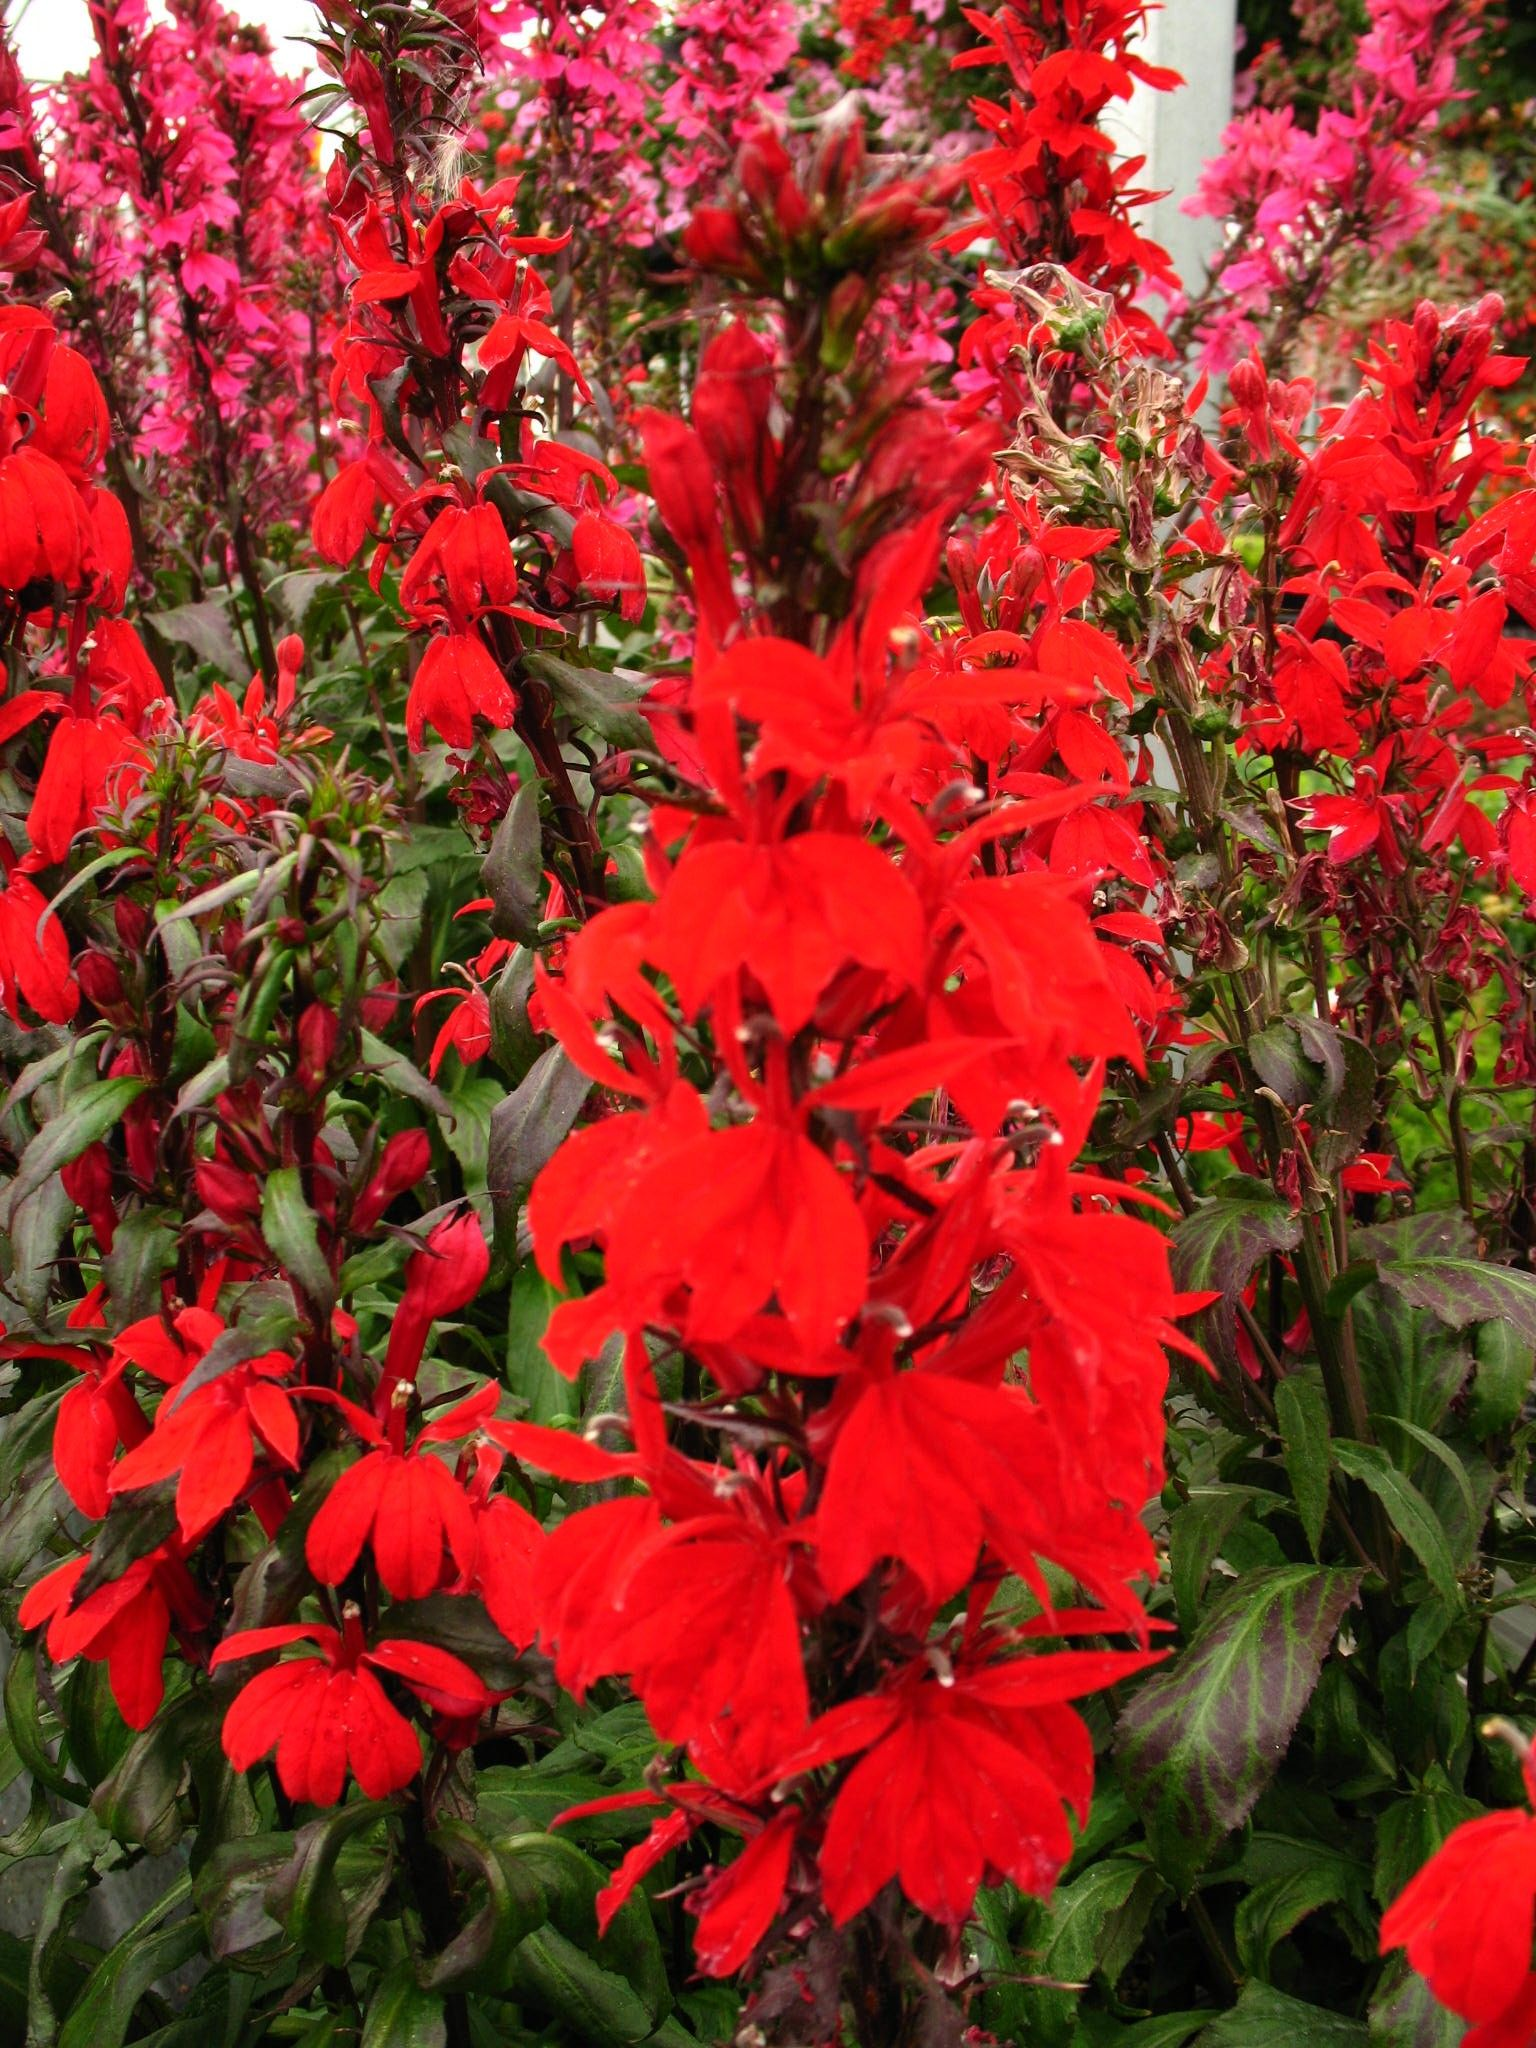 Lobelia Speciosa Starship Scarlet Cardinal Flower 2016 Whats